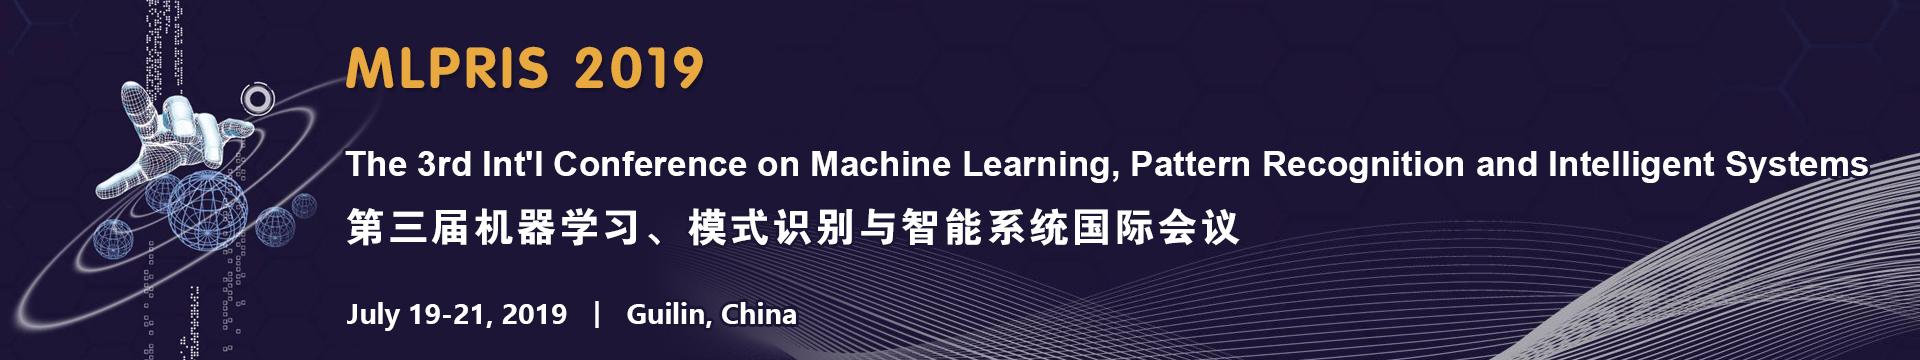 MLPRIS 2019 第三届机器学习、模式识别与智能系统国际会议(桂林)